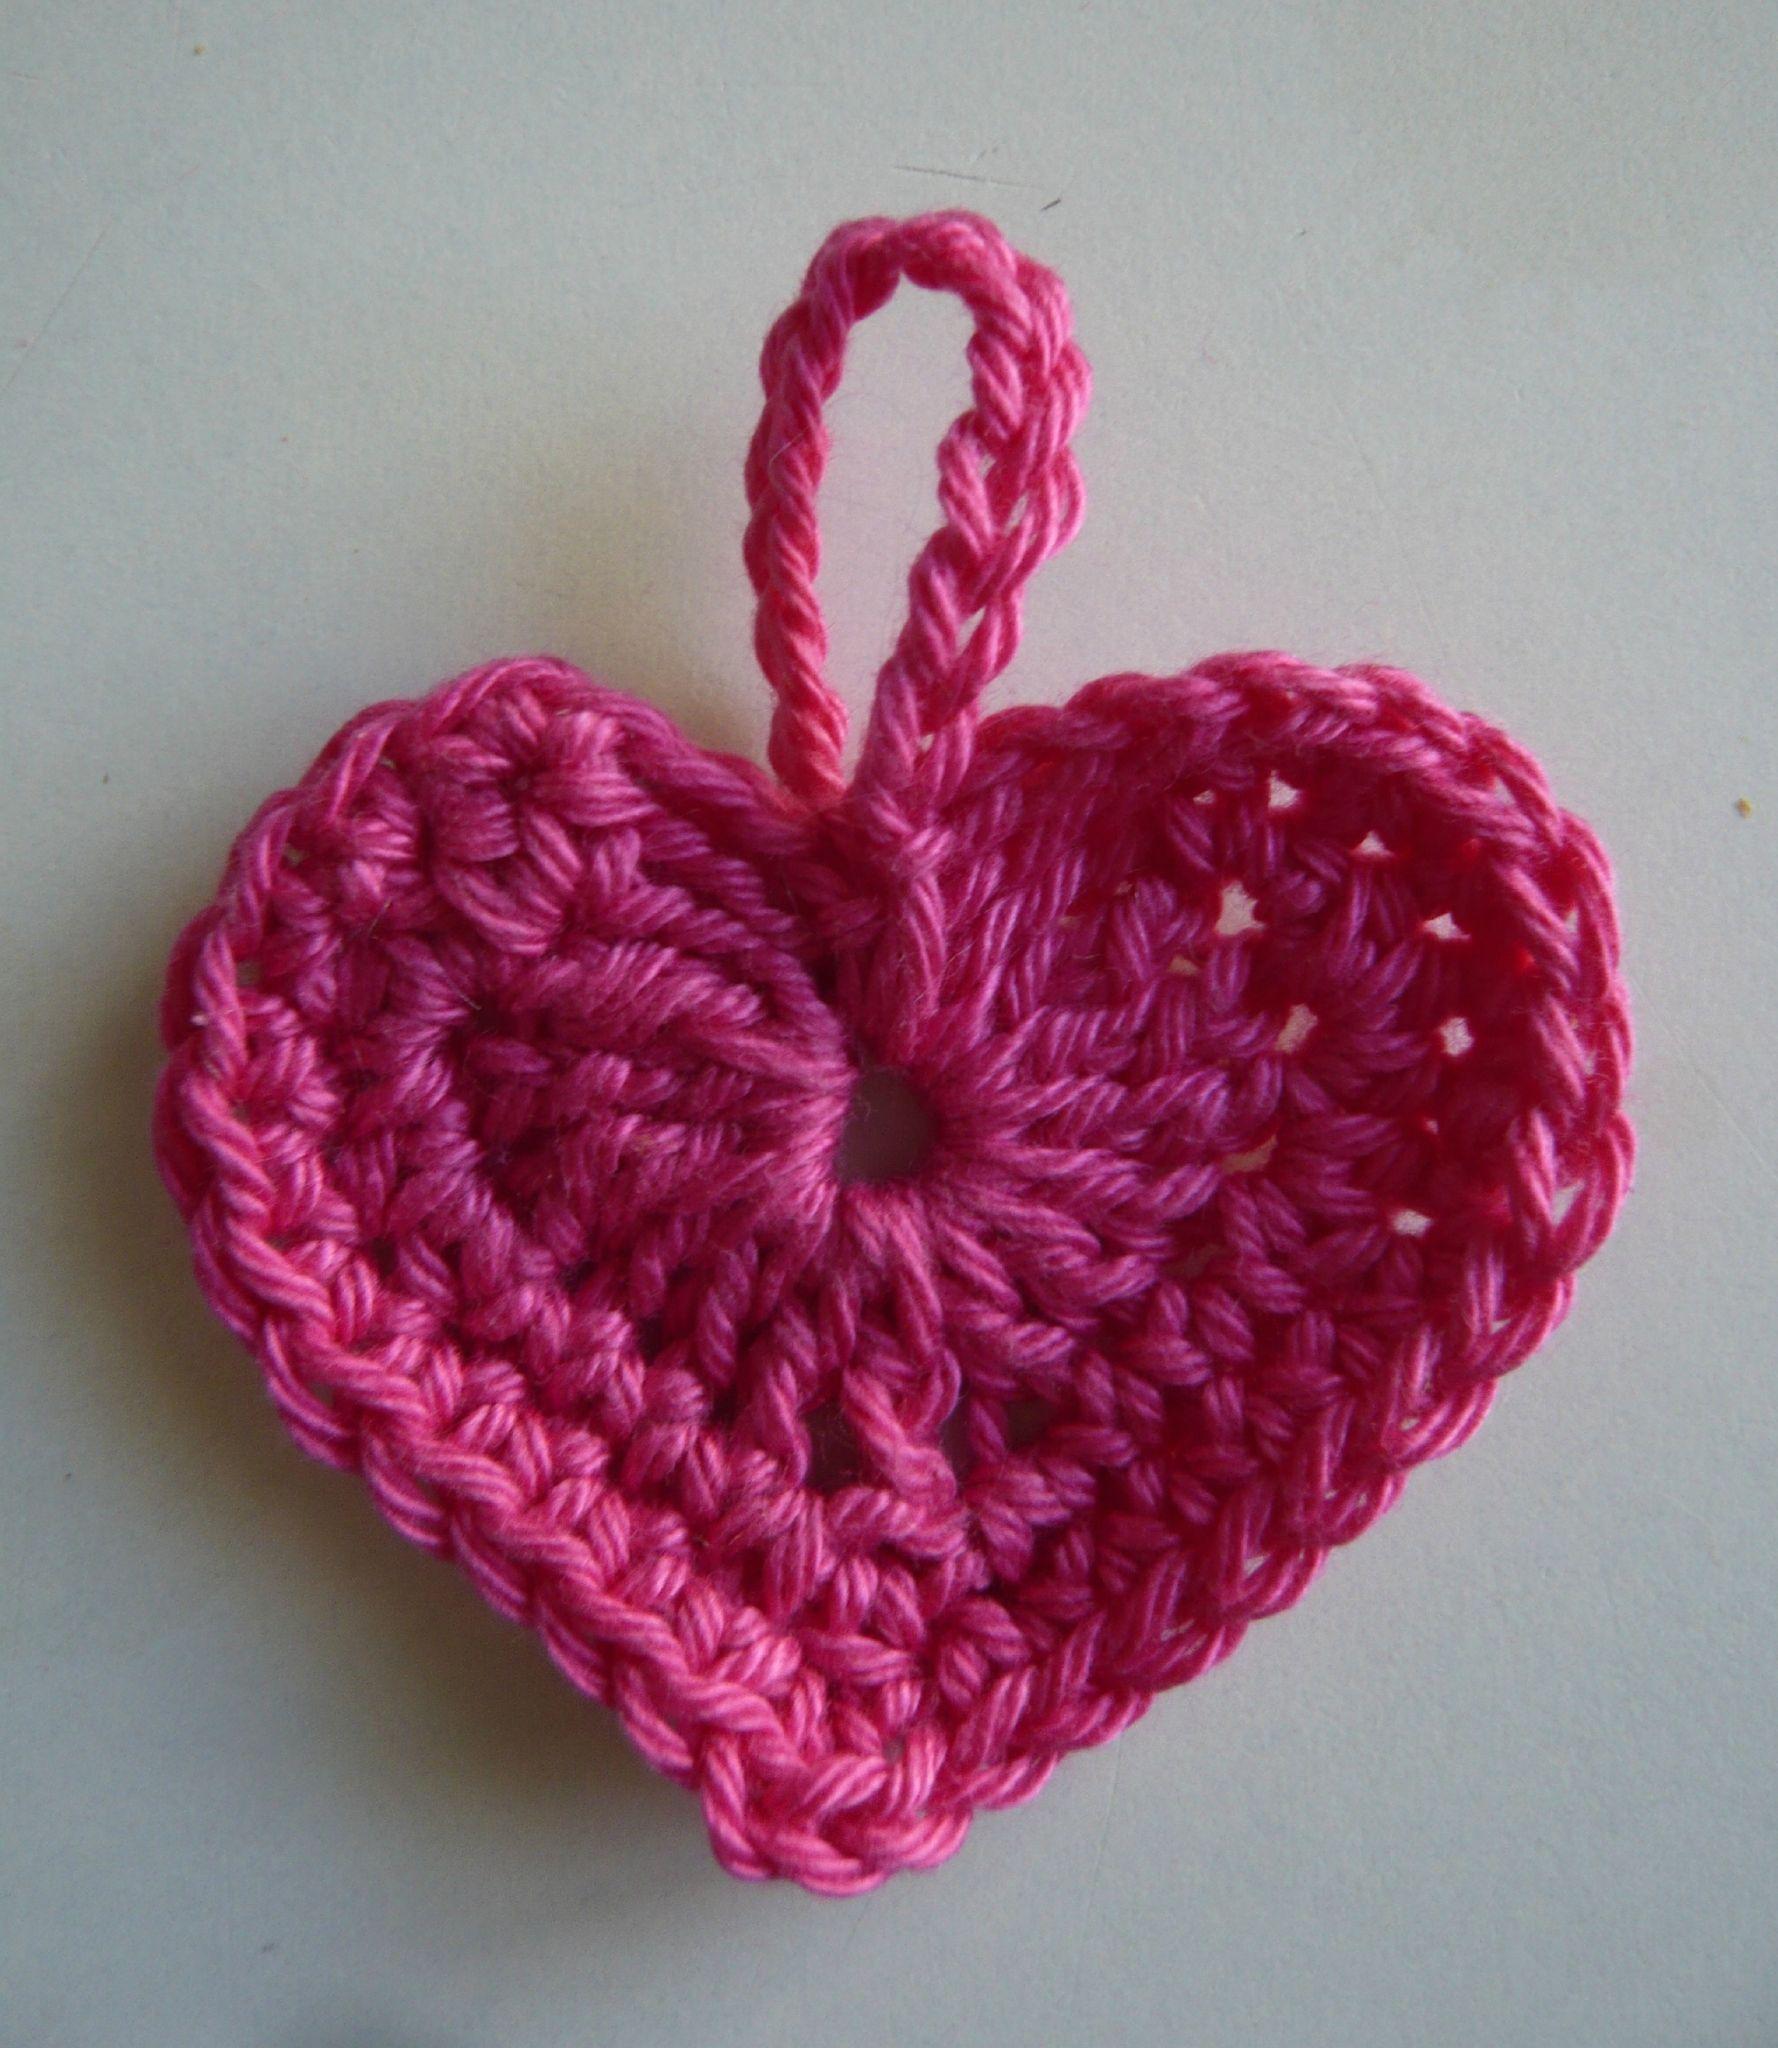 tuto coeur crochet projets essayer pinterest tuto coeur et crochet. Black Bedroom Furniture Sets. Home Design Ideas